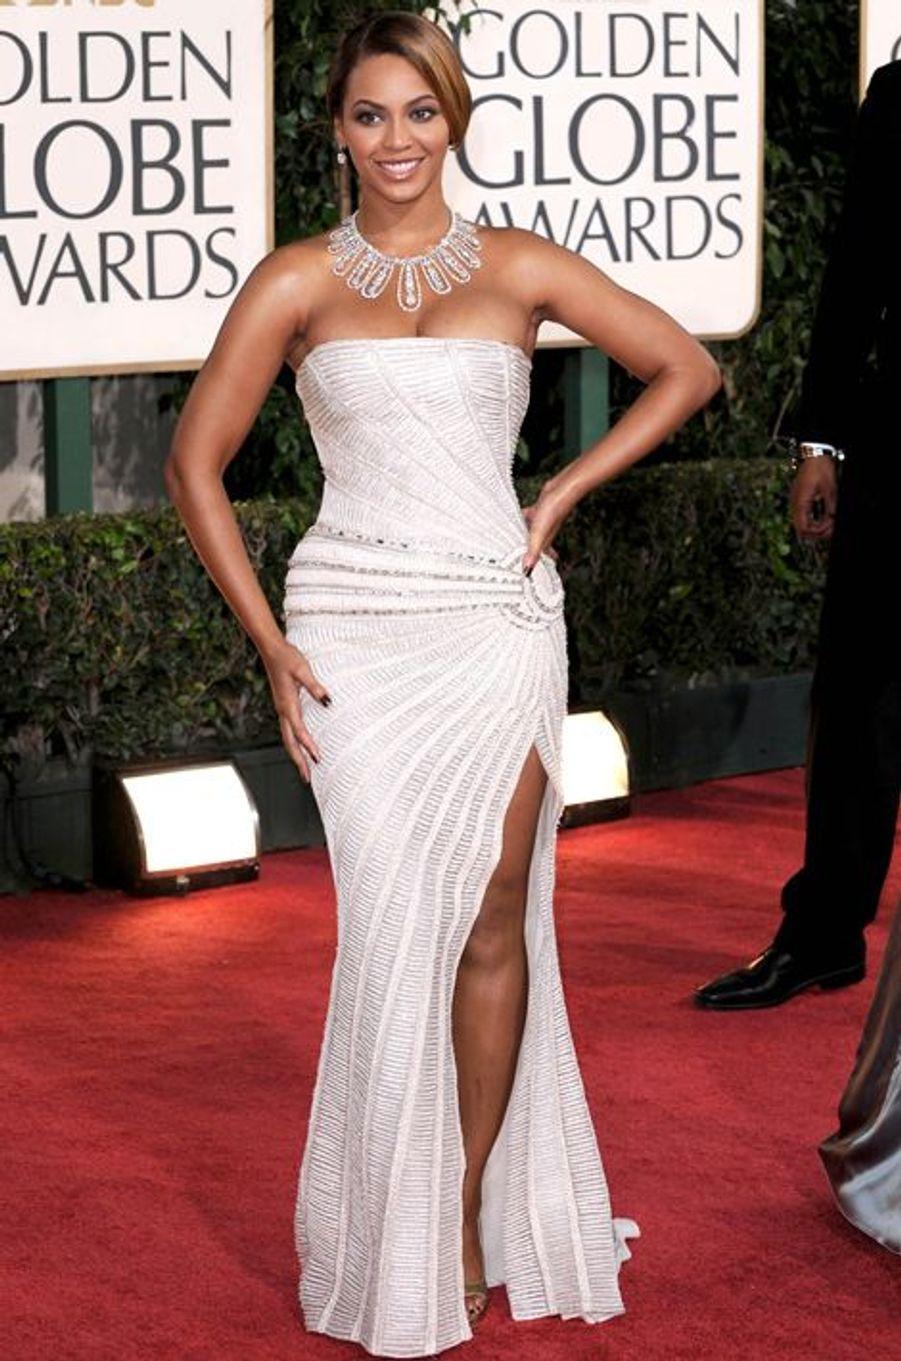 En janvier 2009 aux Golden Globes Awards